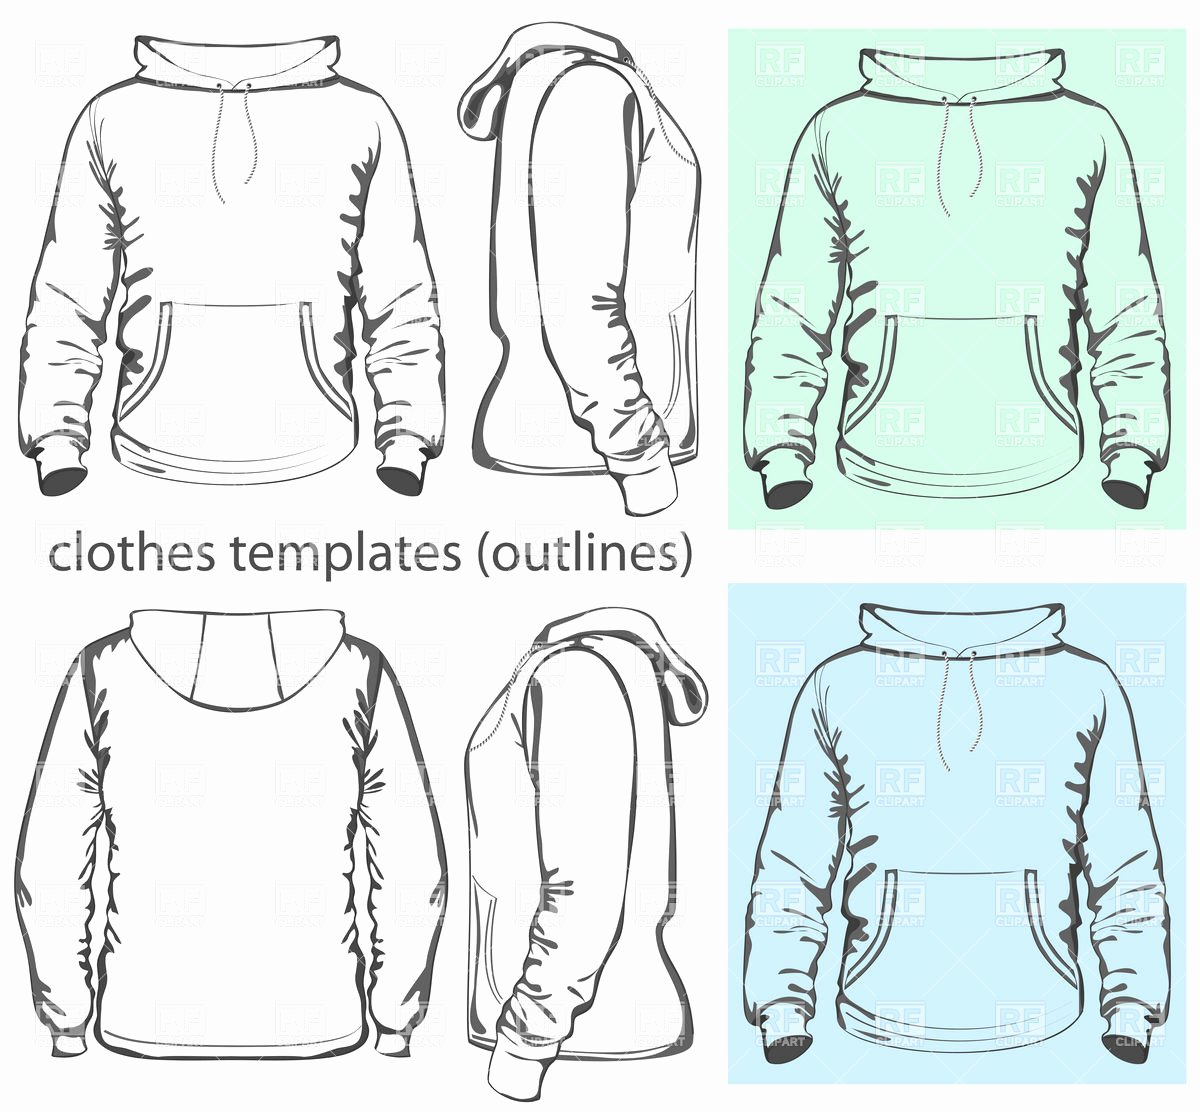 Hooded Sweatshirt Template New Men S Hooded Sweatshirt Template with Pocket On Belly